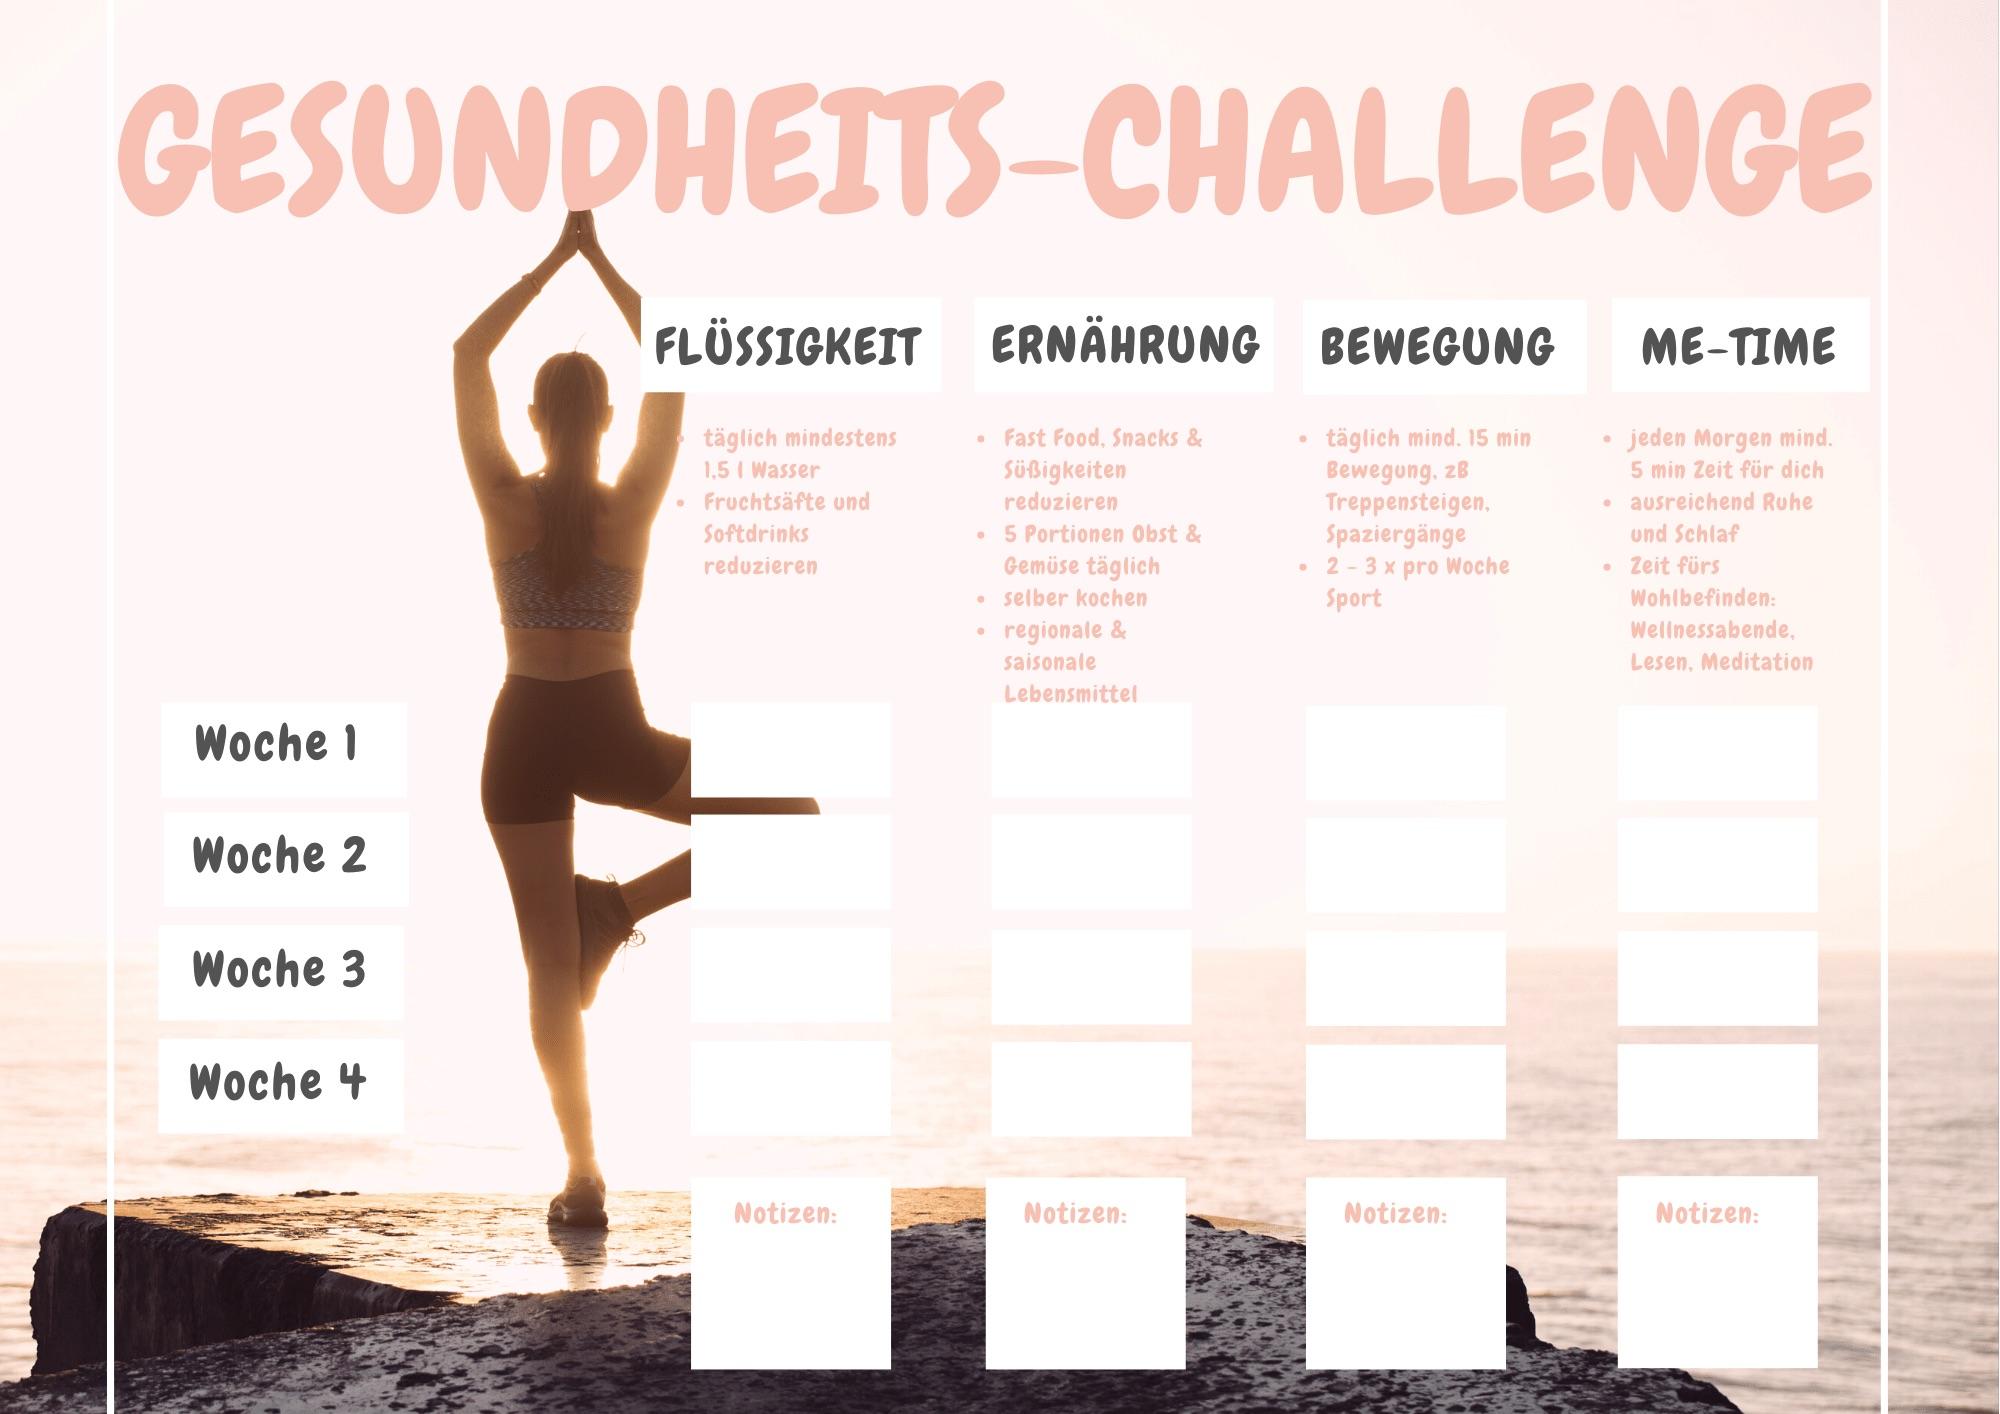 Gesundheits-Challenge